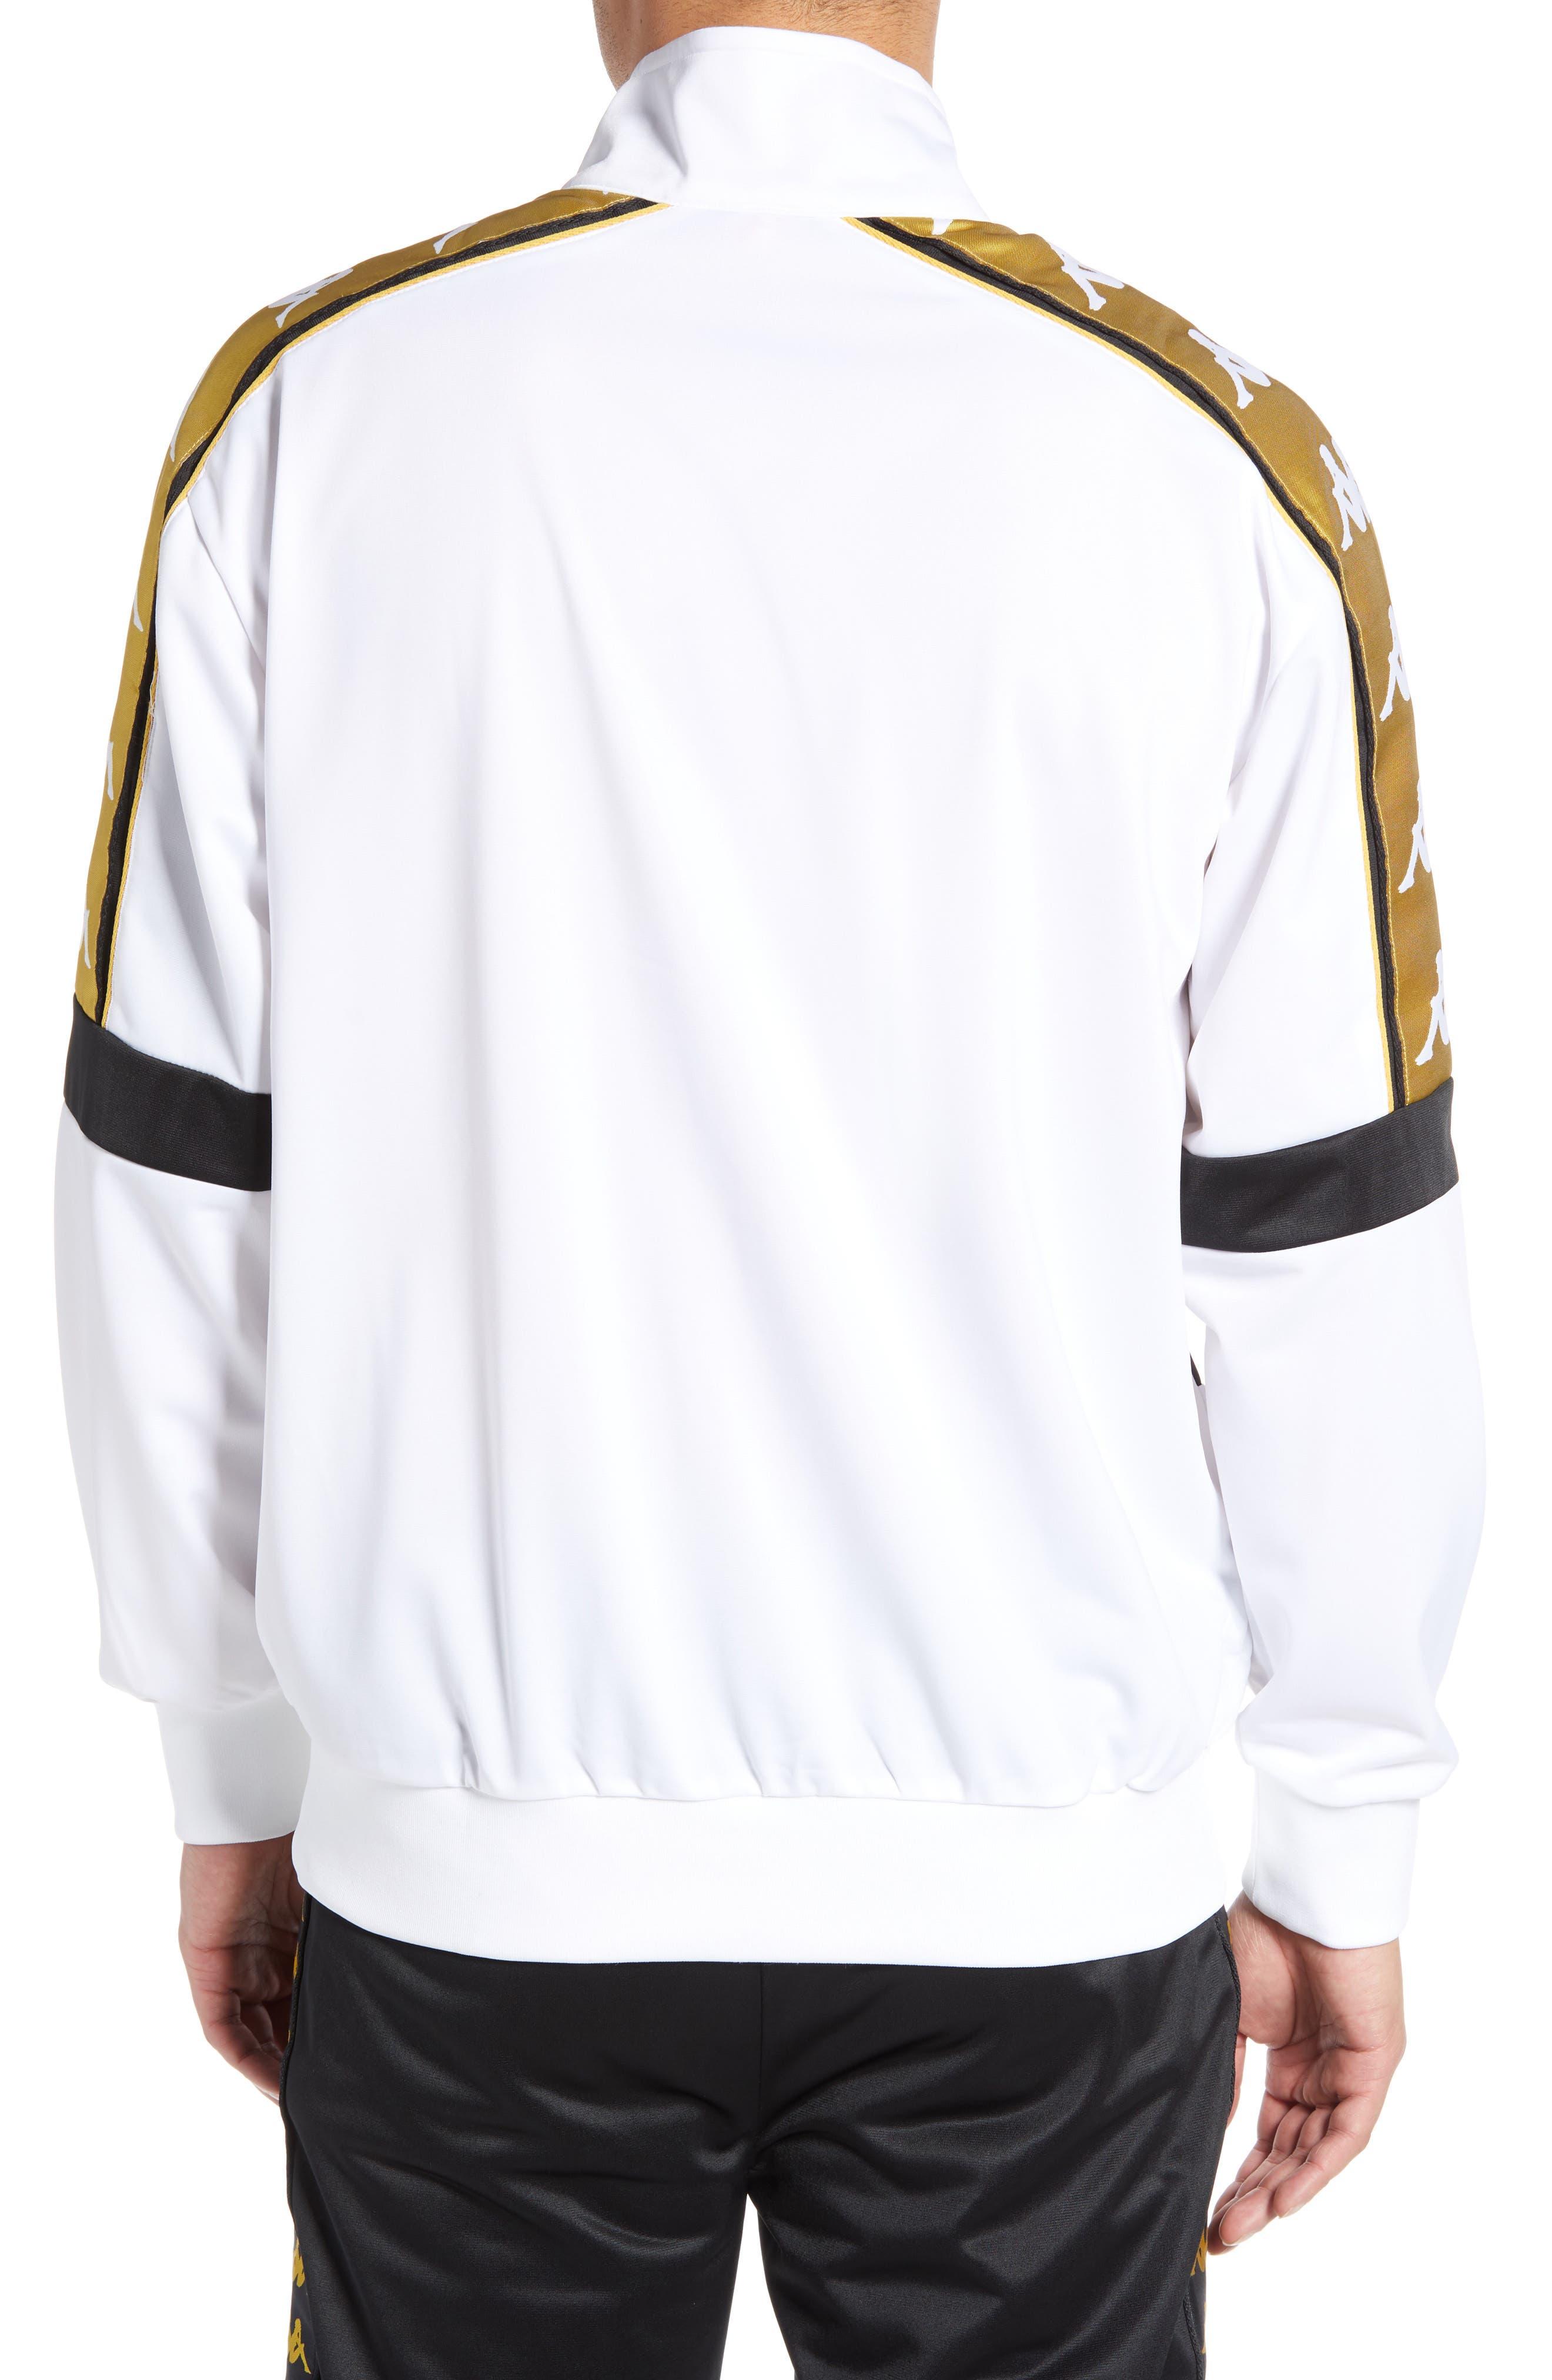 Banda 10 Artan Quarter Snap Pullover,                             Alternate thumbnail 2, color,                             WHITE YELLOW GOLD